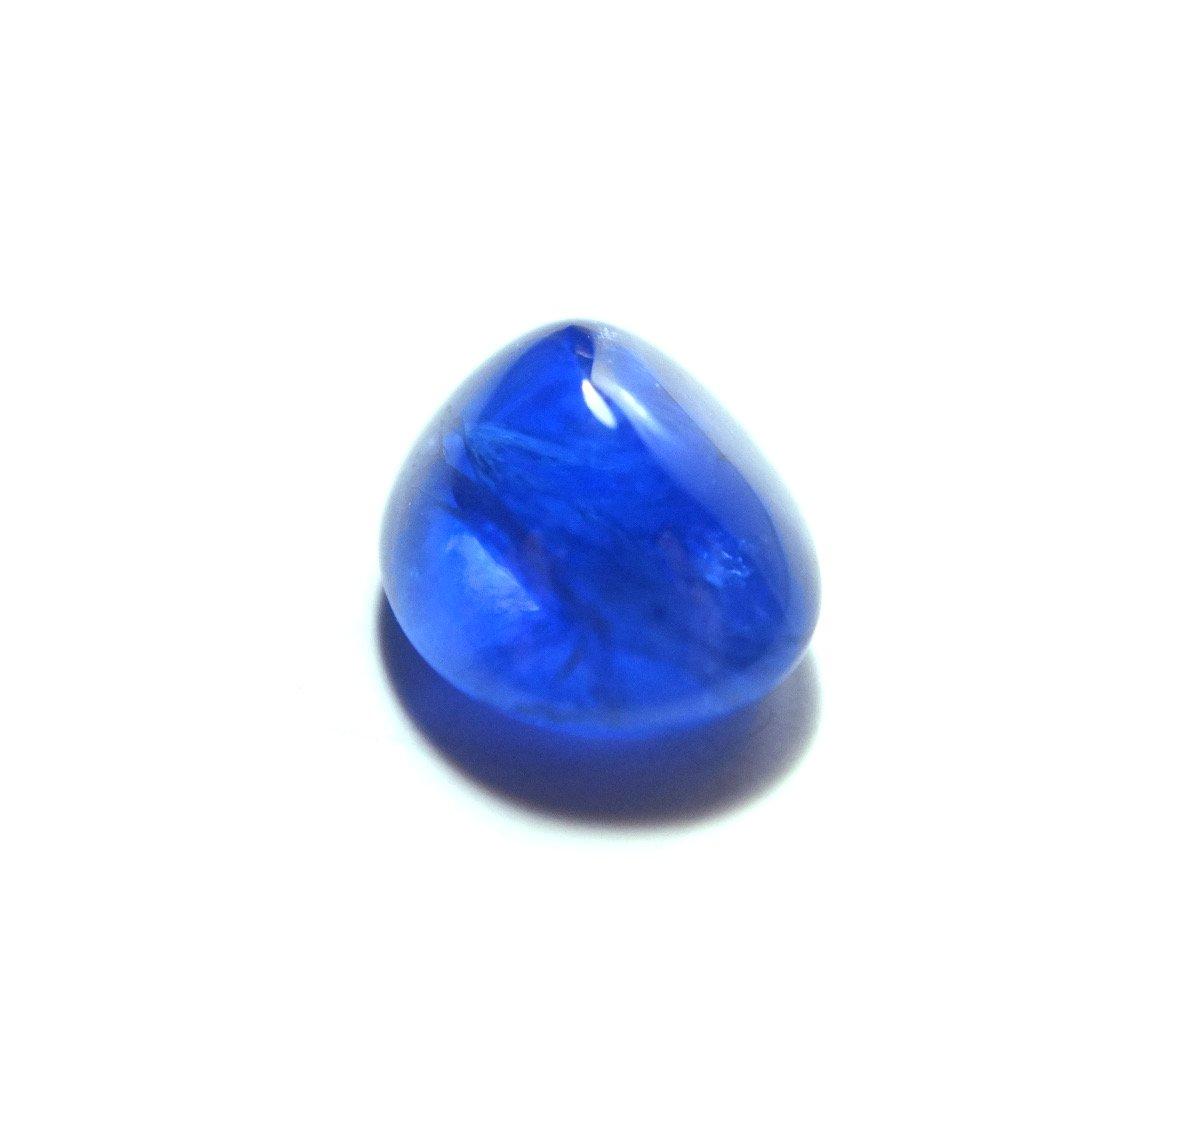 Burmese blue sapphire sugarloaf